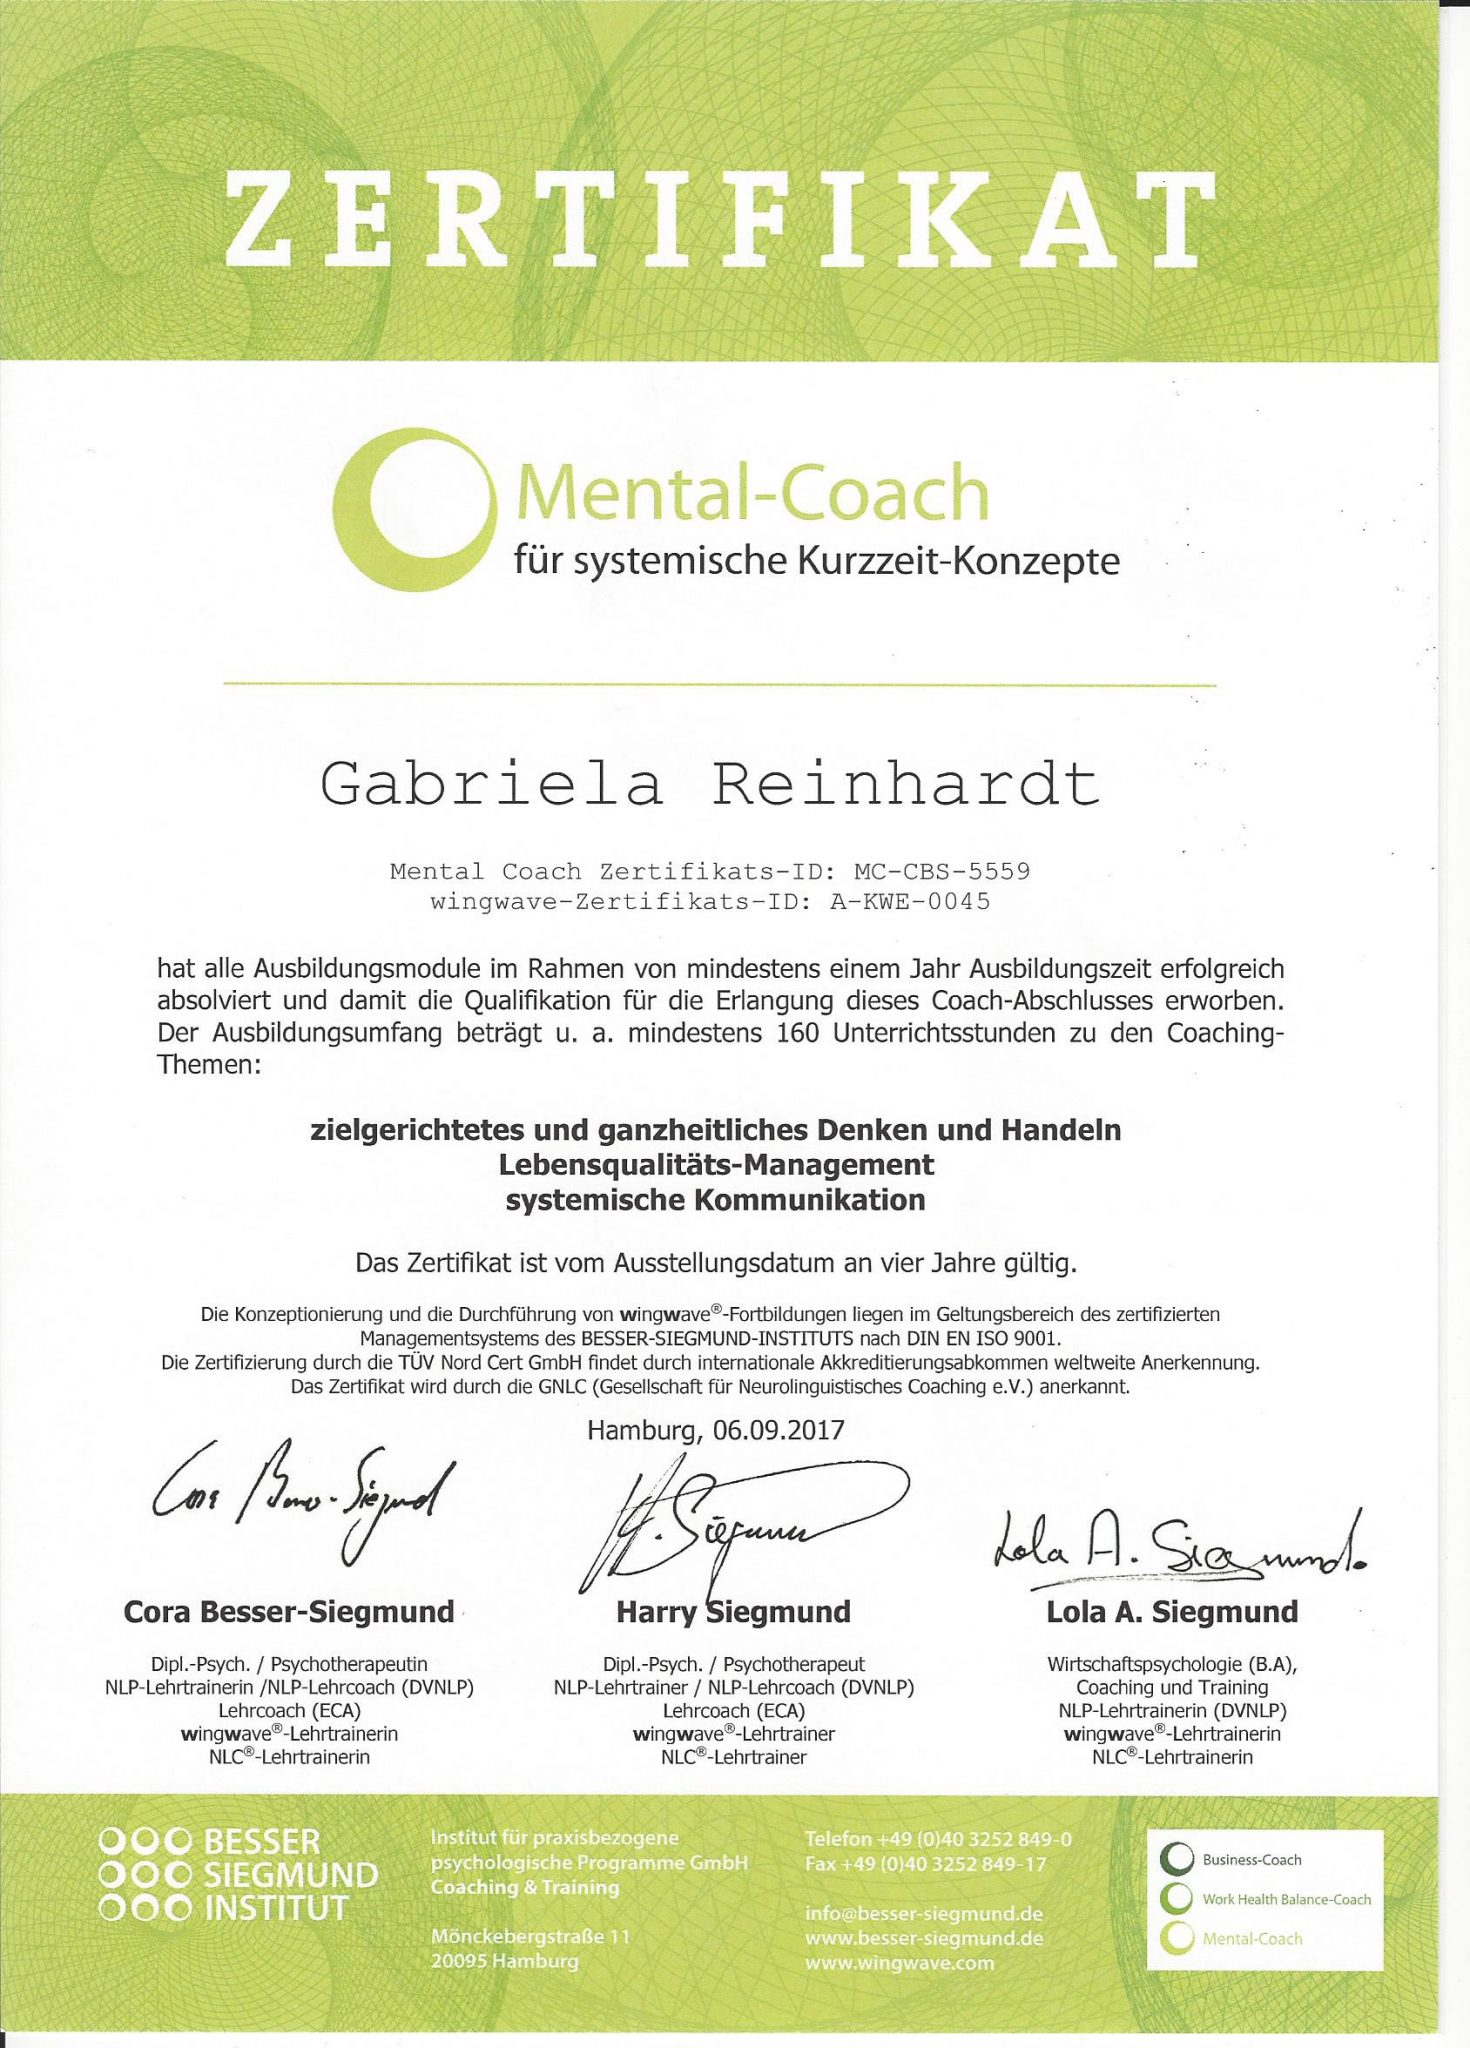 RGH-Consulting | Gabriela Reinhardt | Zertifikate | Zertifikat Mental-Coach